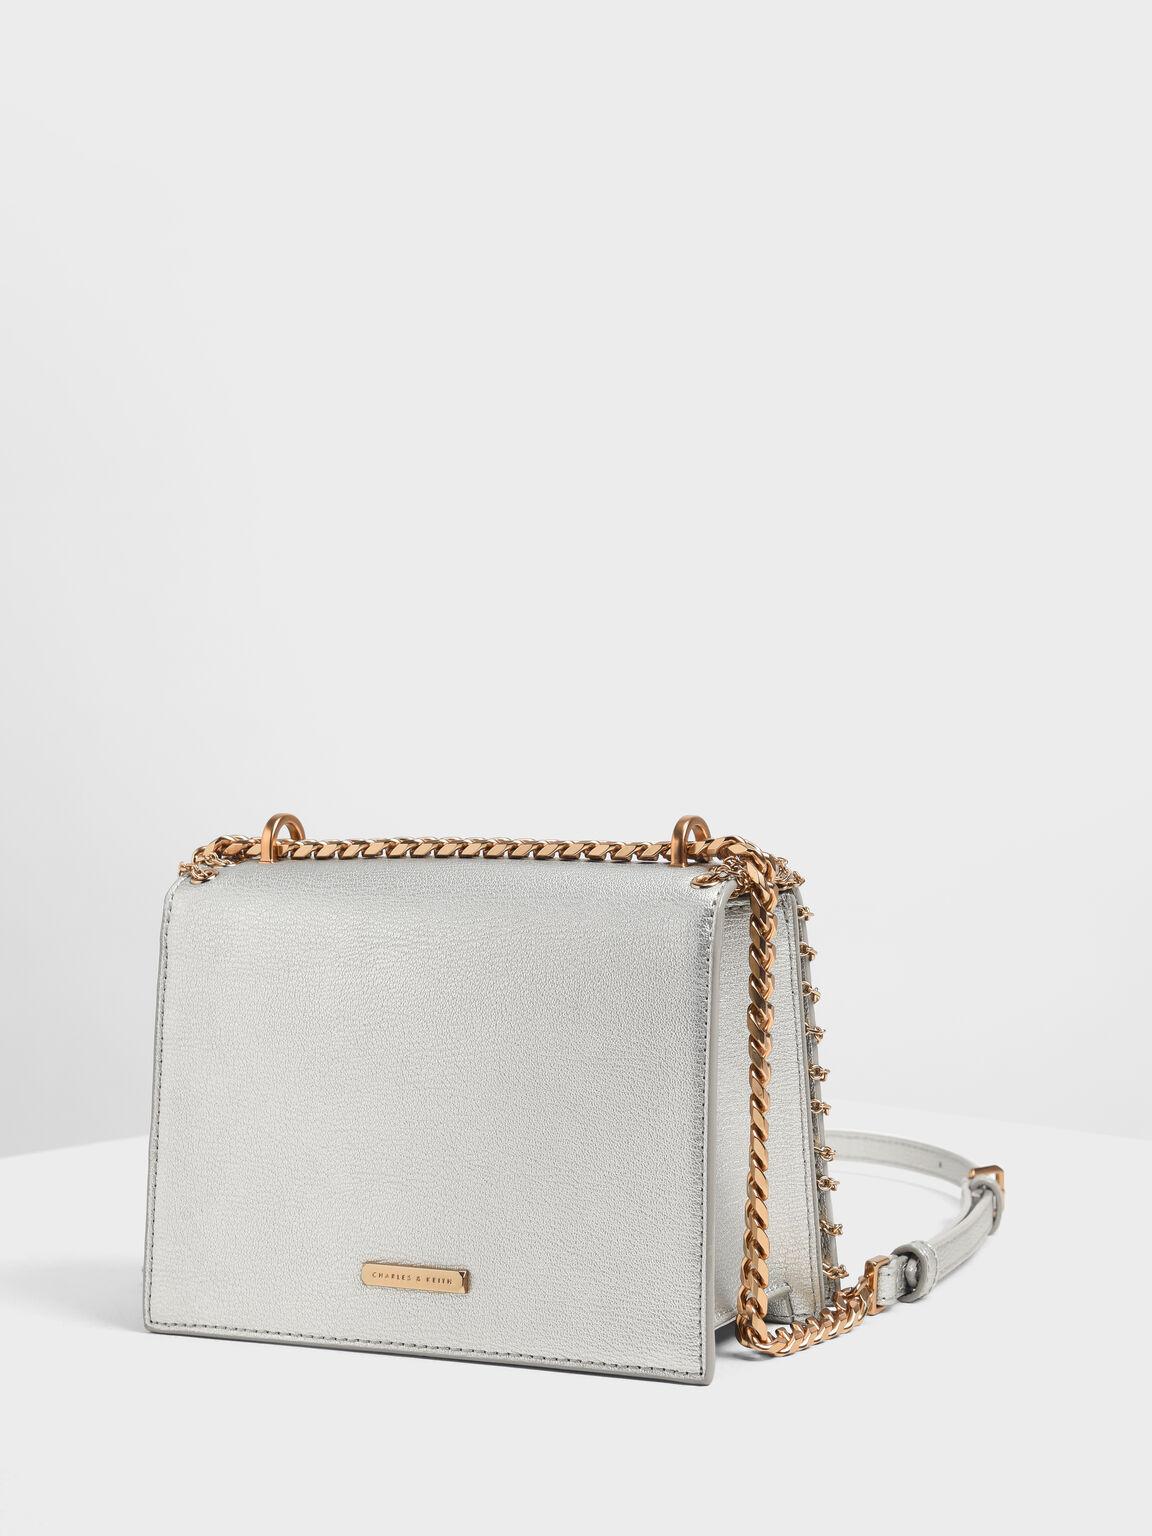 Chain Trim Crossbody Bag, Silver, hi-res